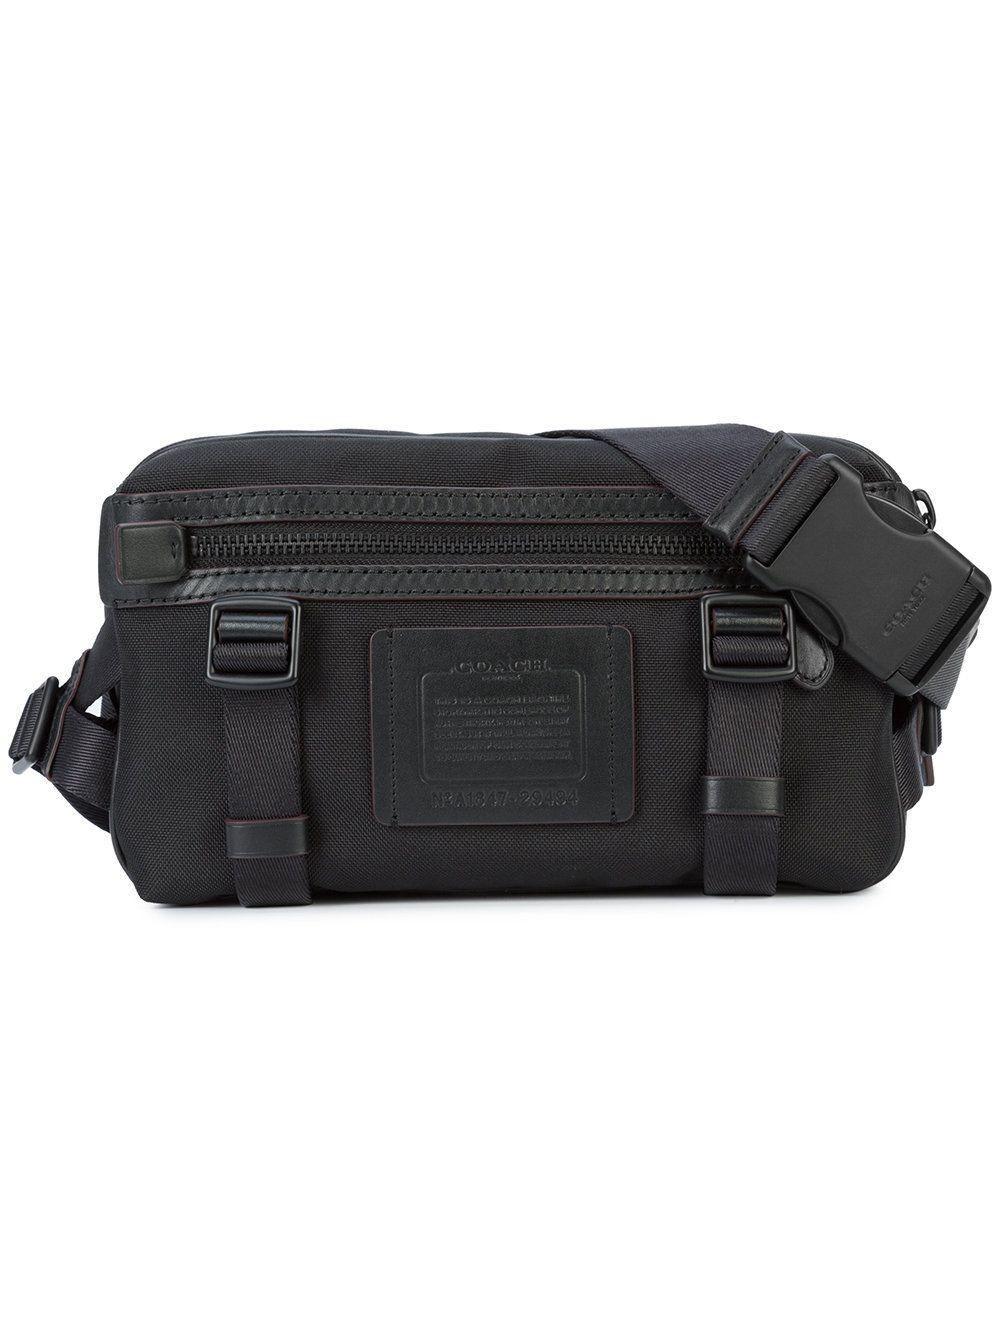 447ea8921d COACH Utility Pack belt bag | Bags | Bags, Messenger bag men, Belt